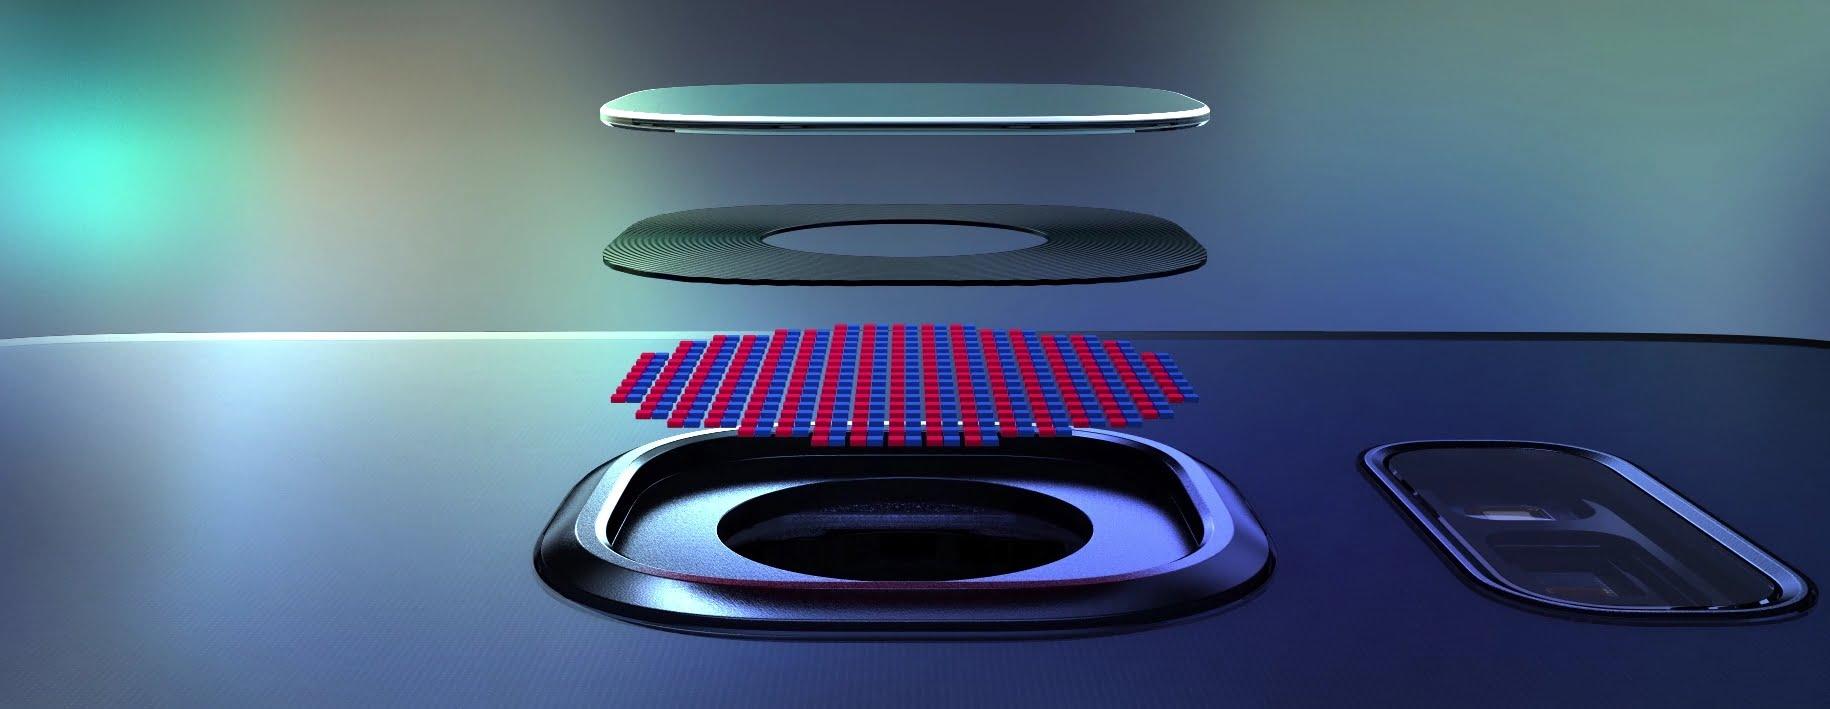 galaxy s7 kameras ndan 7 rnek foto raf ve 7 bilgi donan m g nl. Black Bedroom Furniture Sets. Home Design Ideas